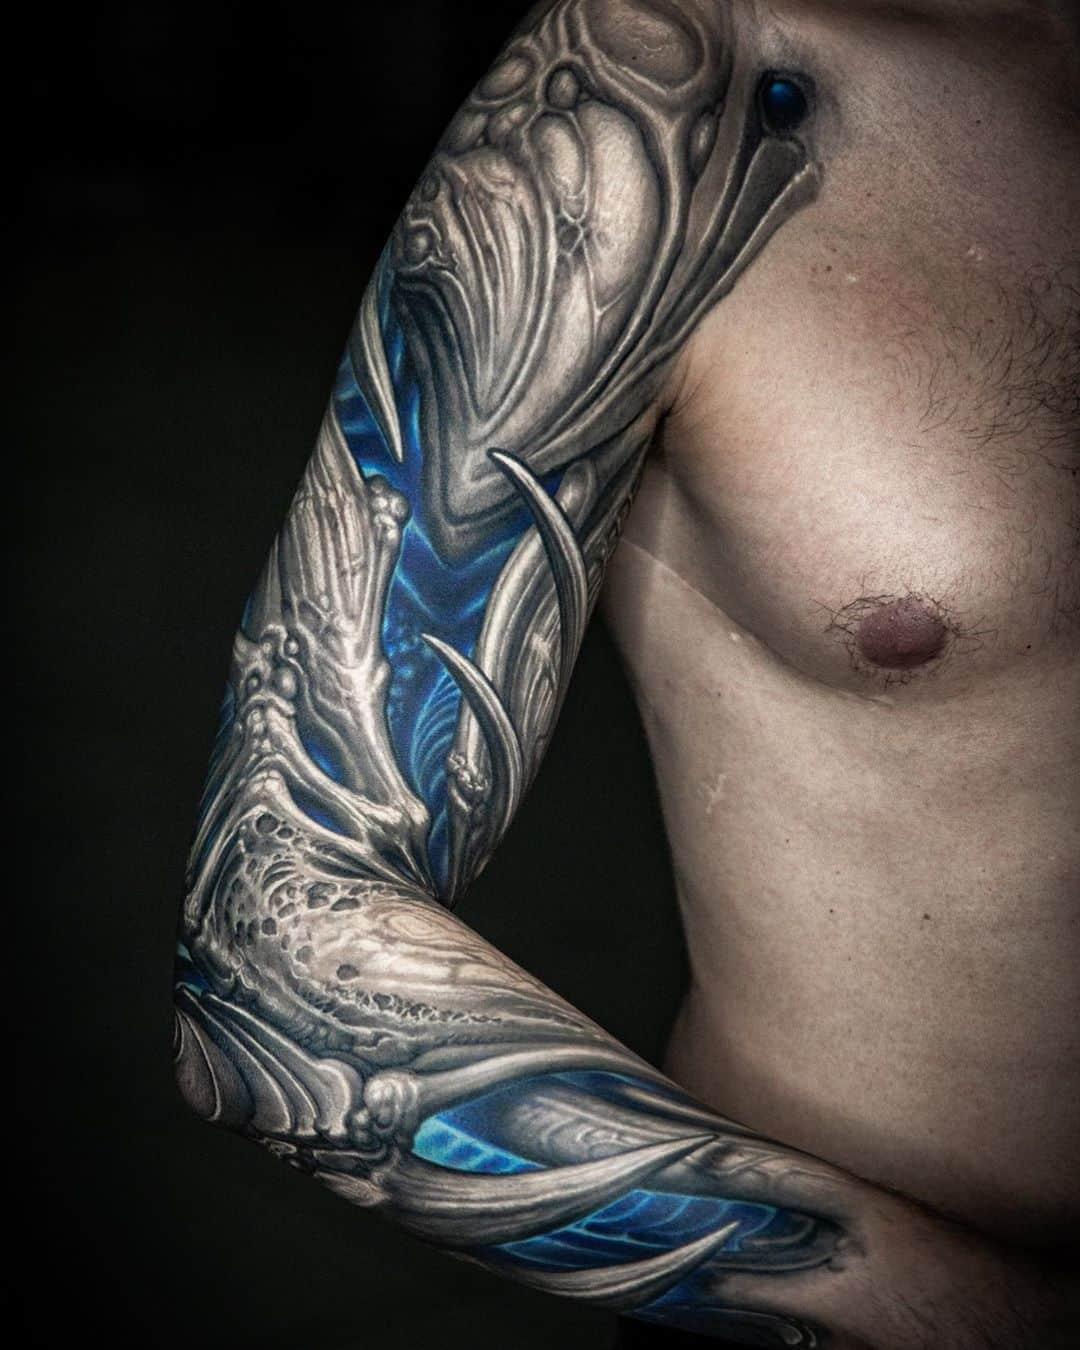 3d-tattoo-biomechanical